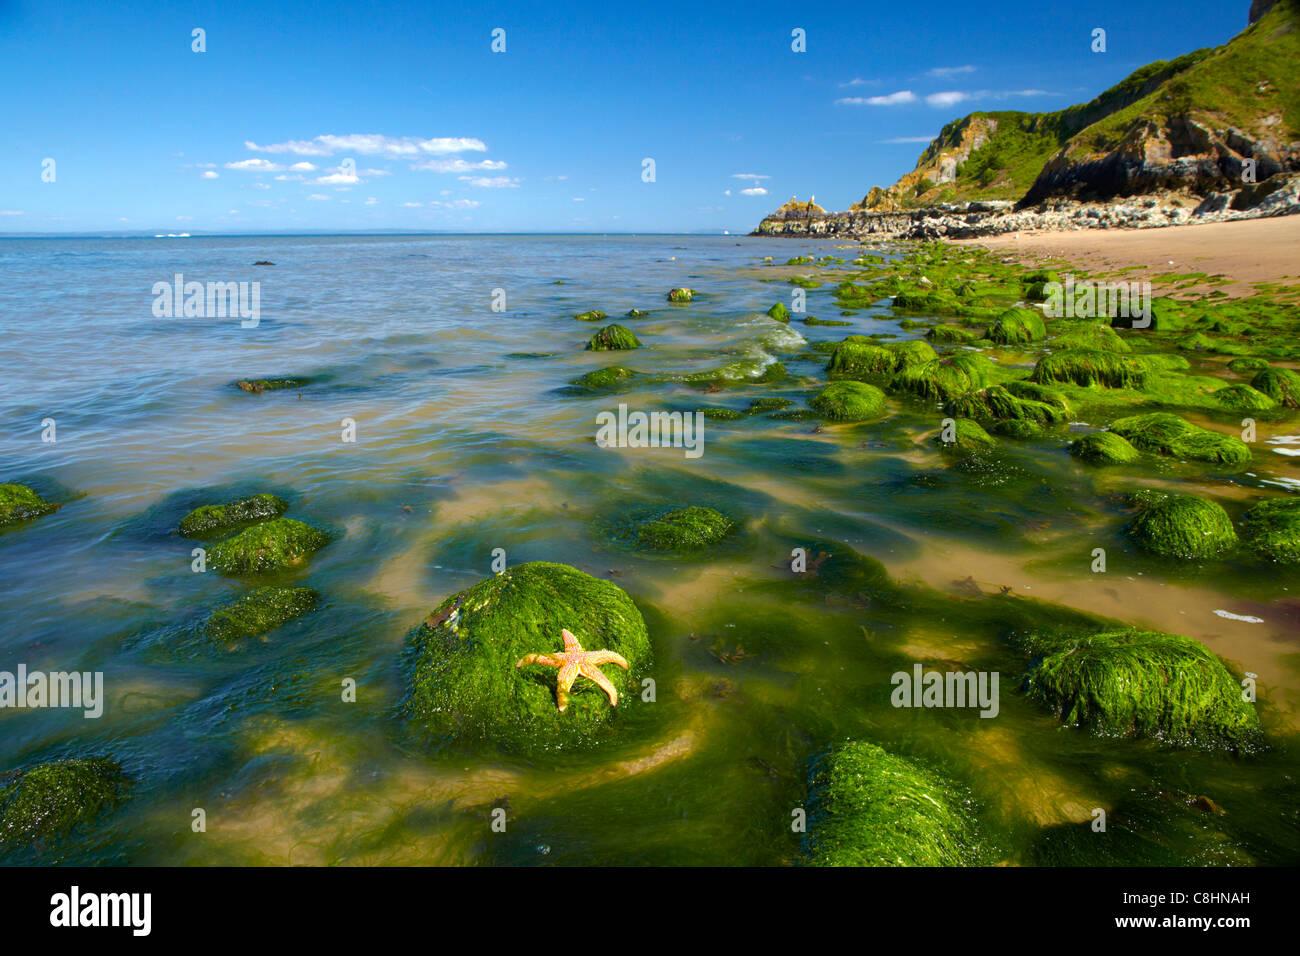 Seaweed covered shoreline, Caldey Island, Pembrokeshire, with Common Starfish. - Stock Image